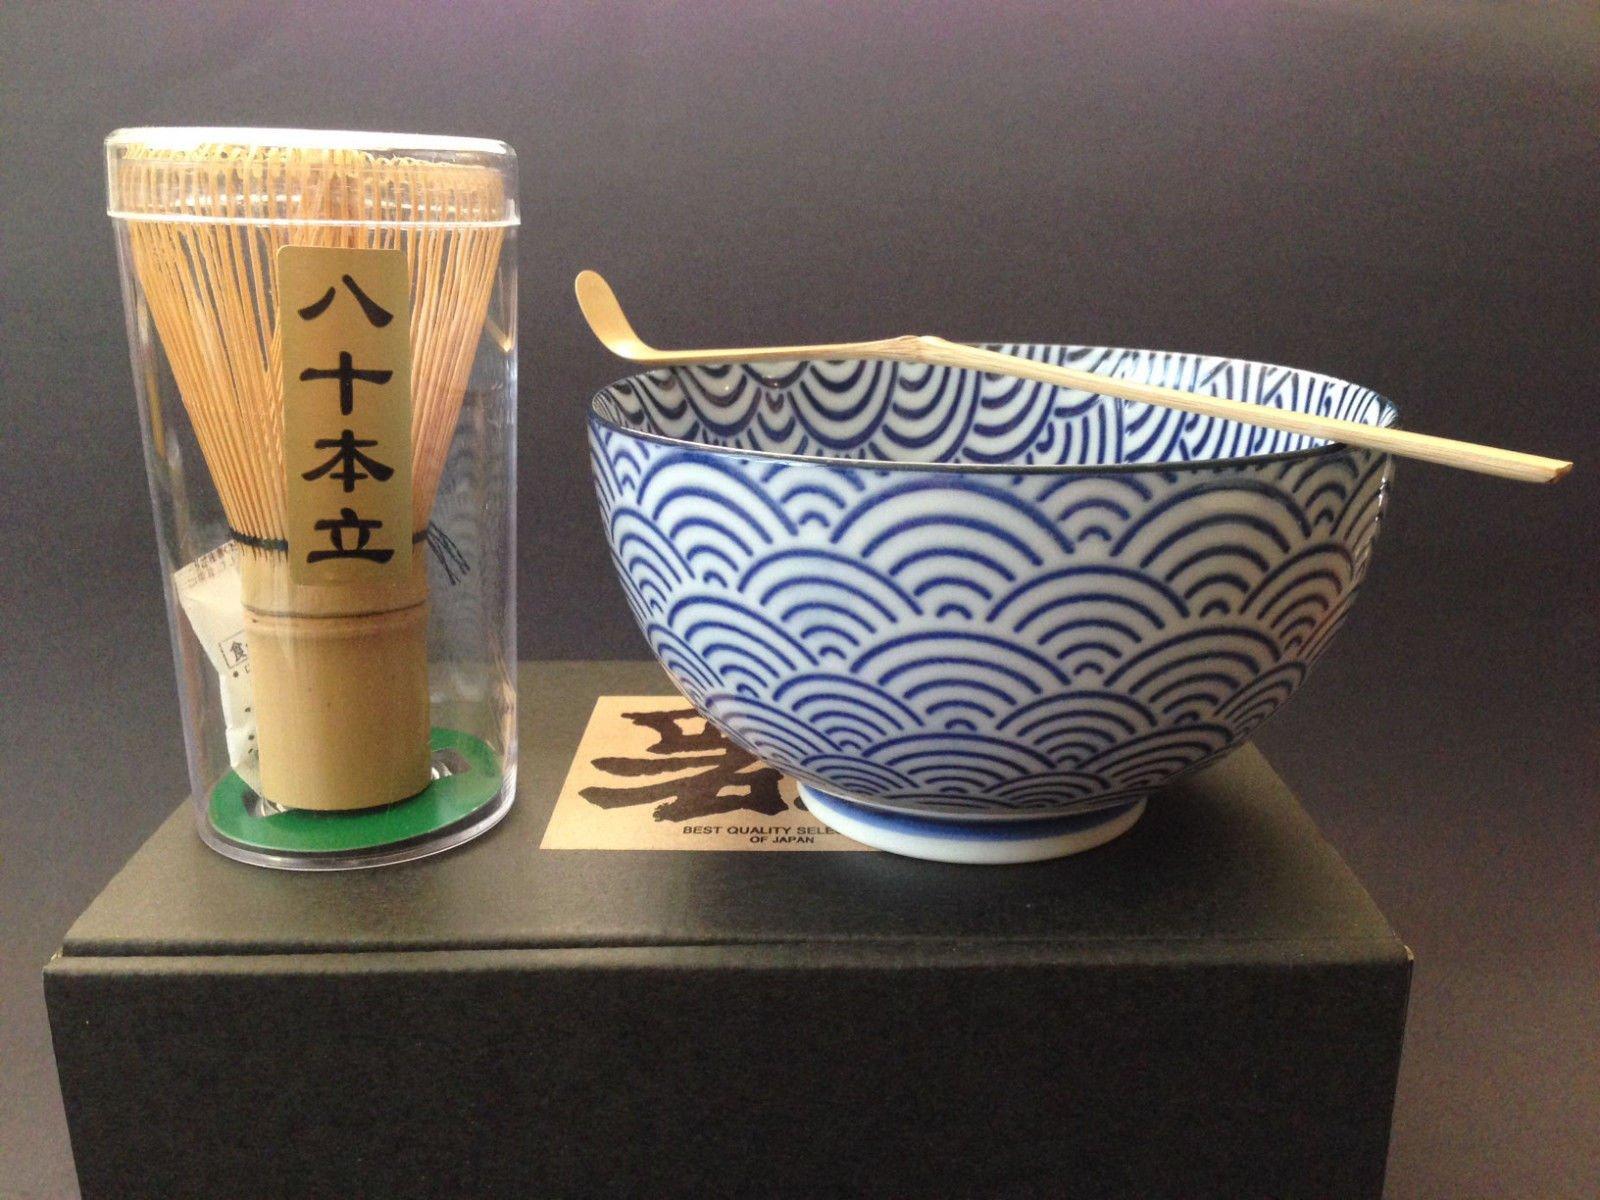 Japanese Blue Wave Matcha Bowl Cup Whisk Tea Ceremony Gift Set by Yokohama Gifts (Image #1)